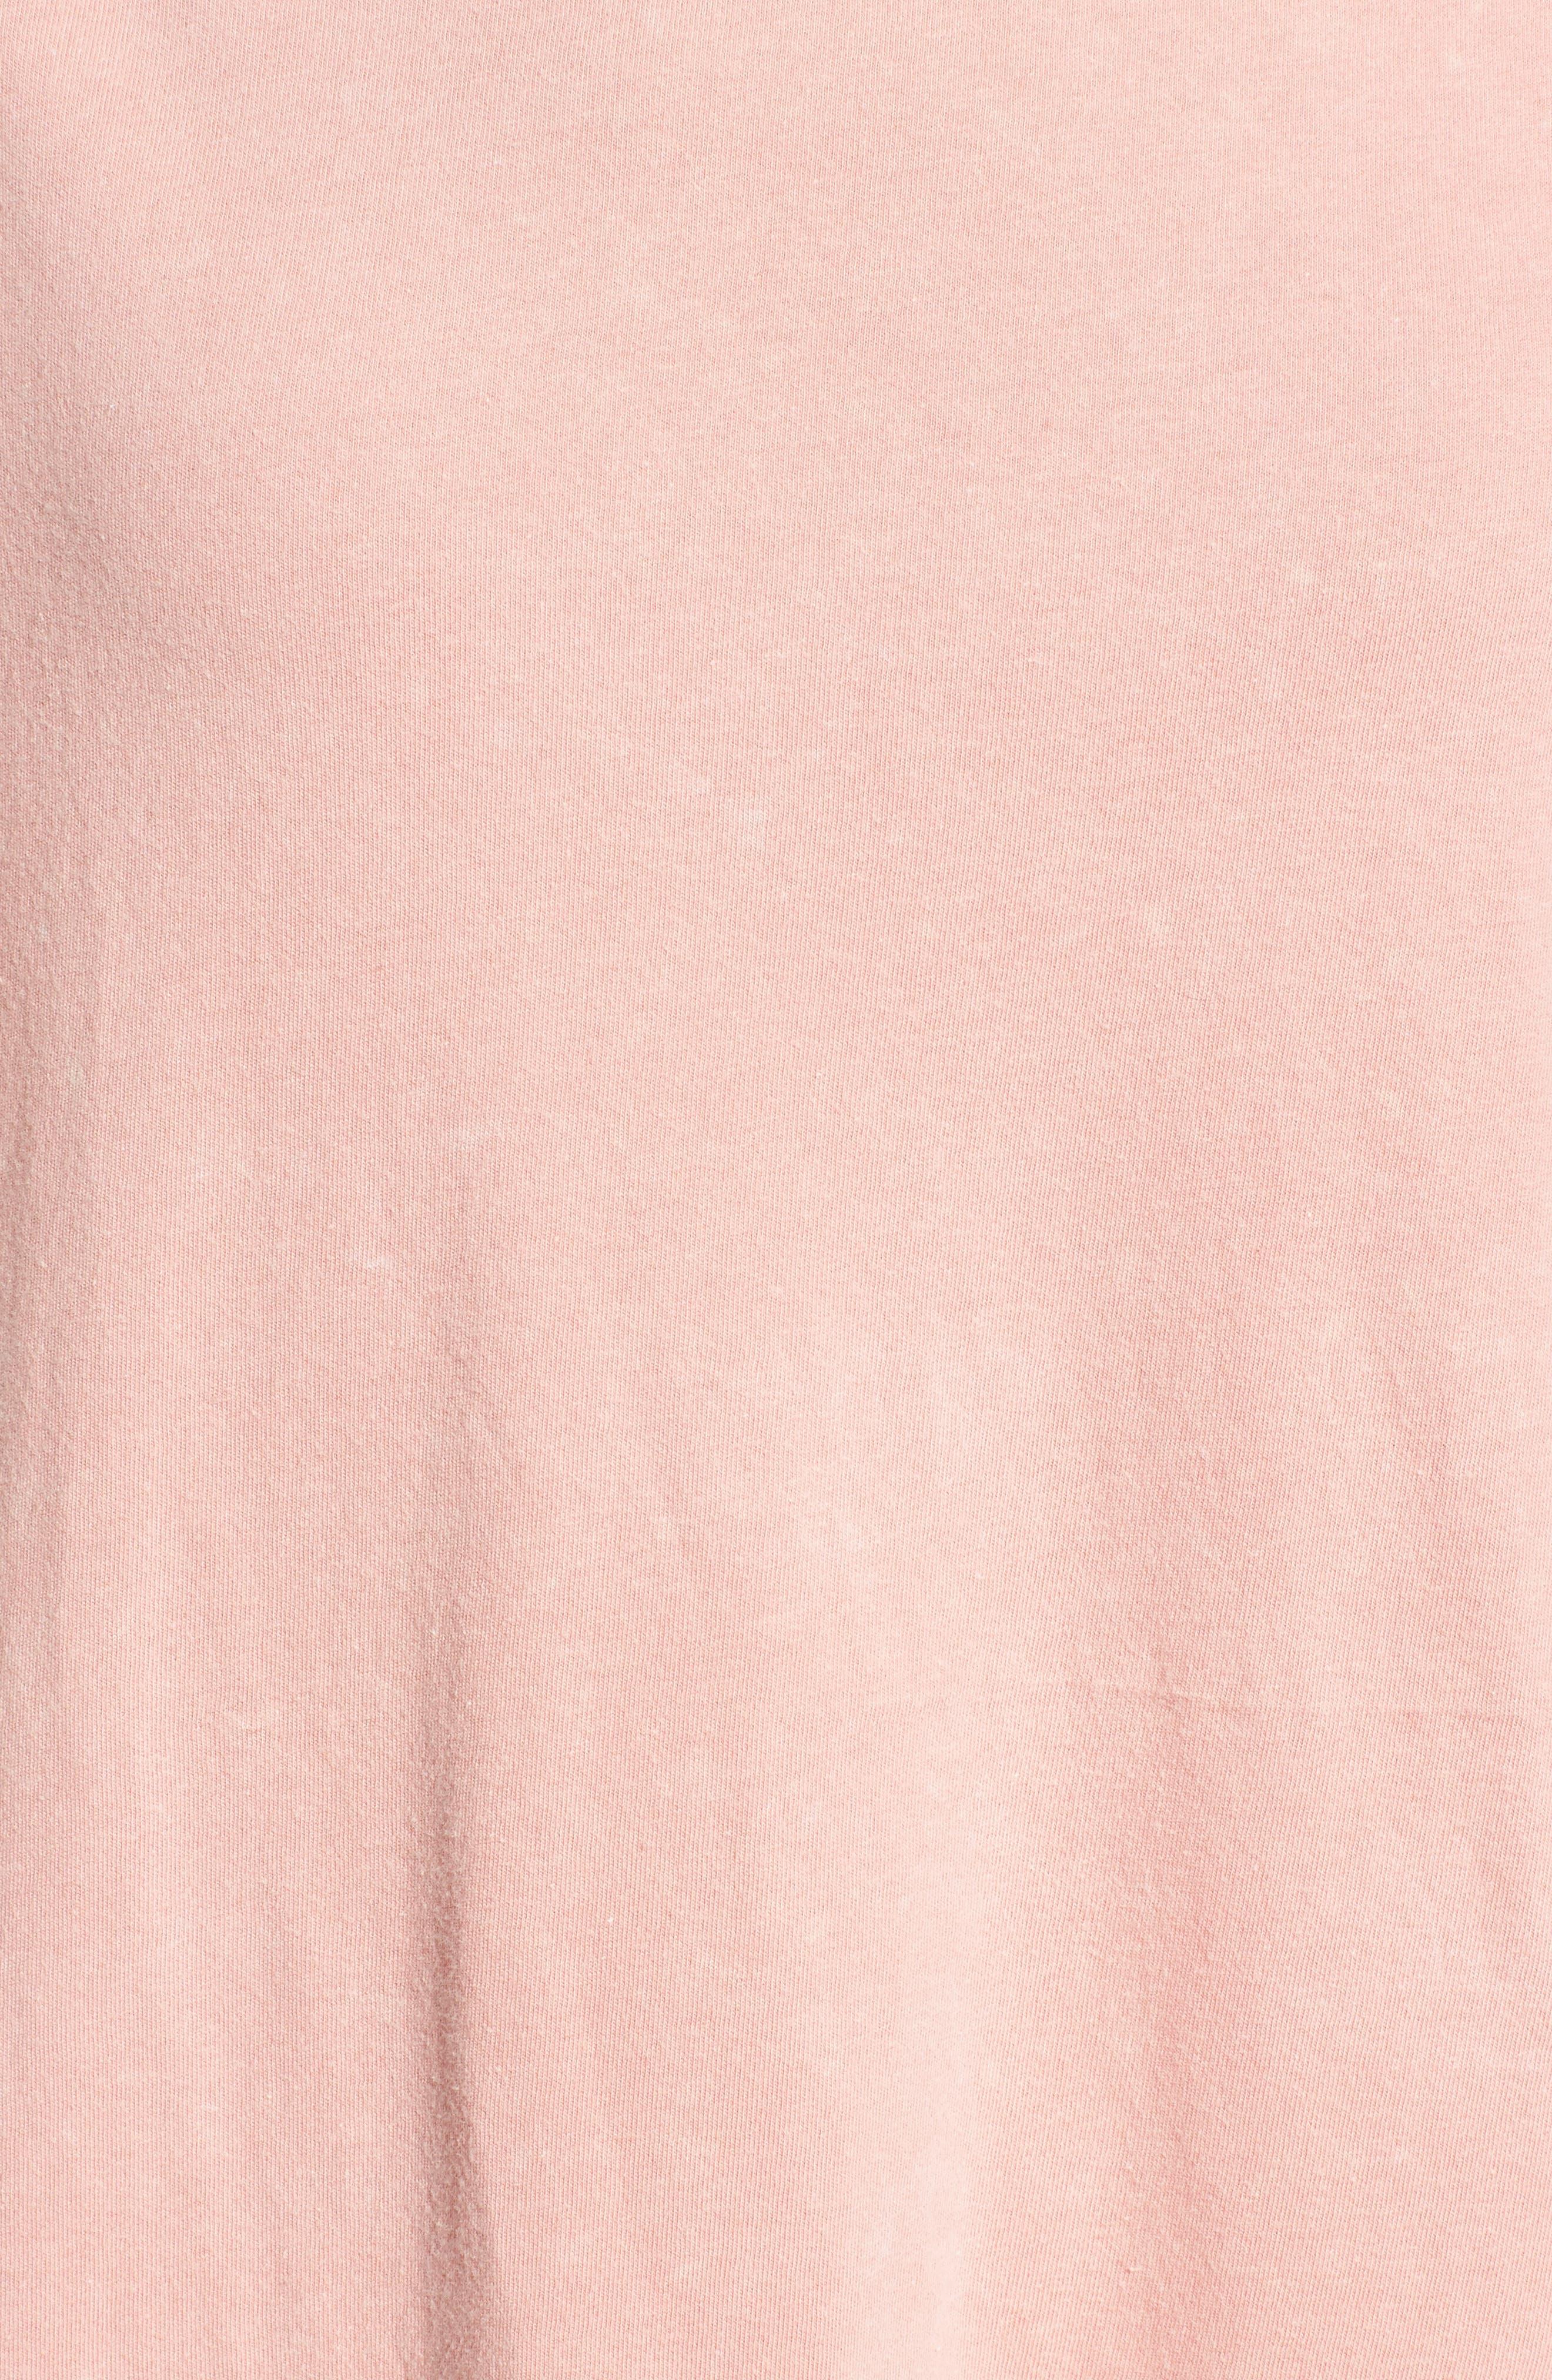 Stonewash Ruffle Trim Dress,                             Alternate thumbnail 10, color,